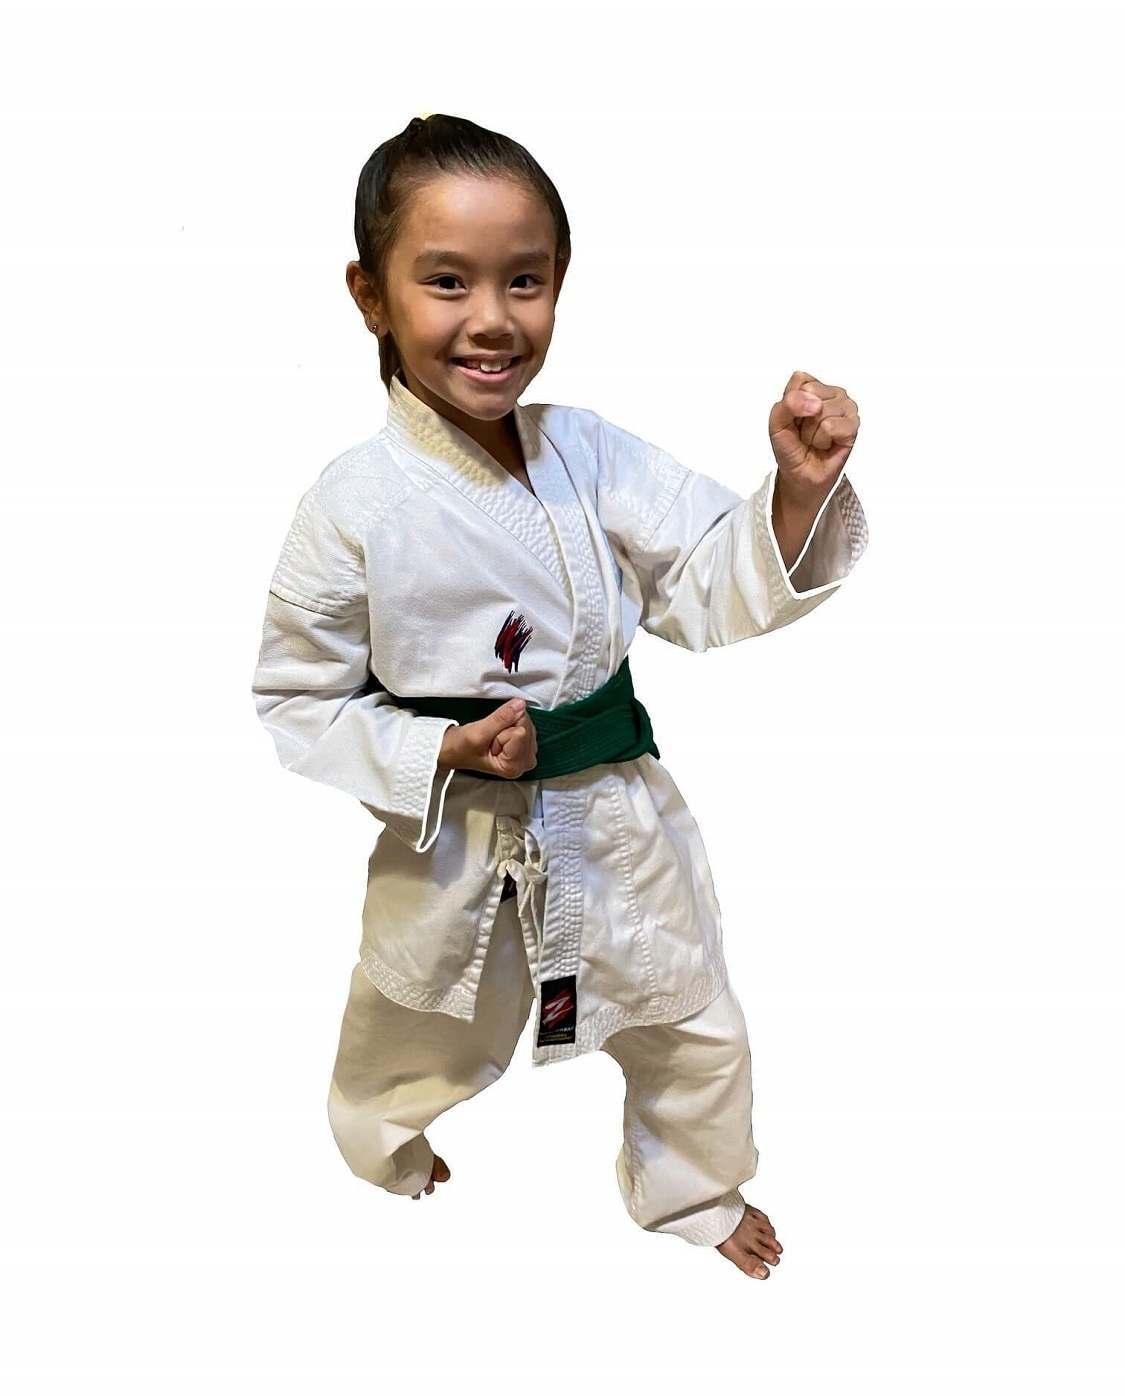 Webp.net Resizeimage, Sma Karate Spartanburg, SC